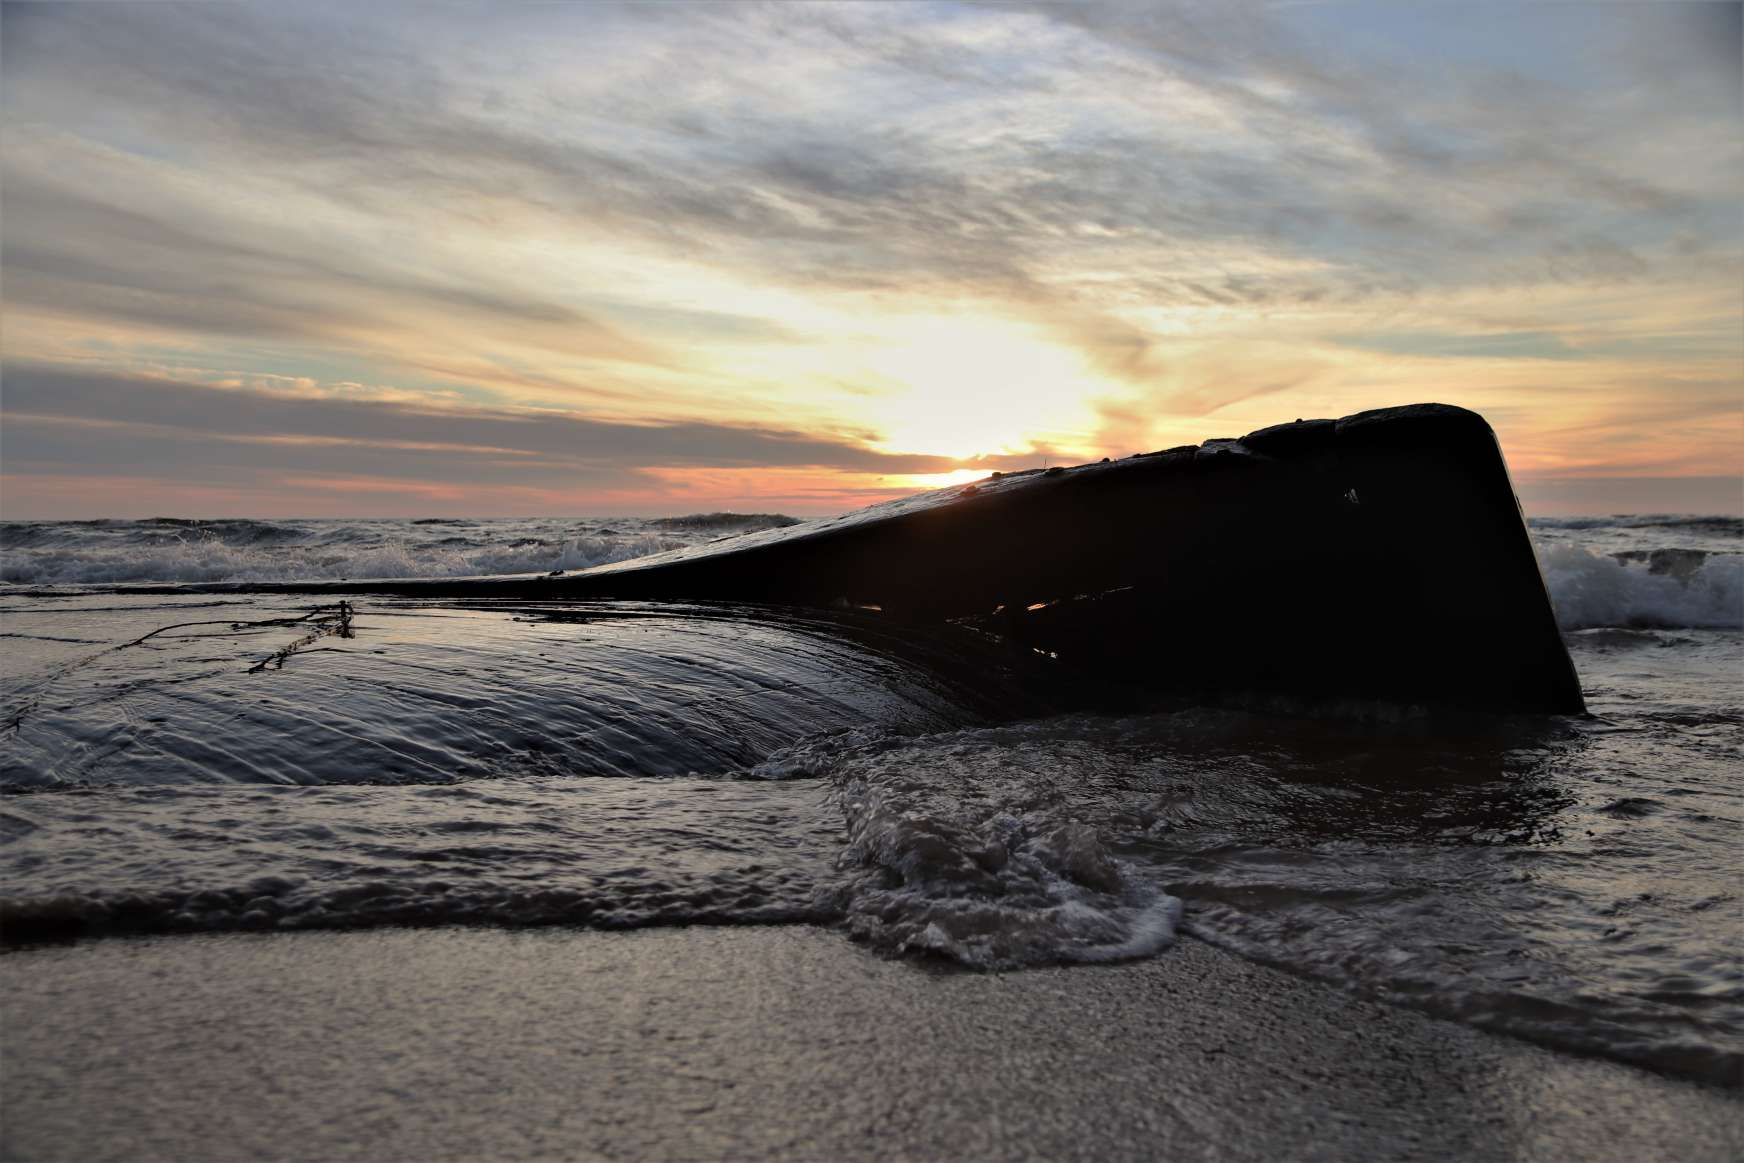 Lakeshore shipwreck update